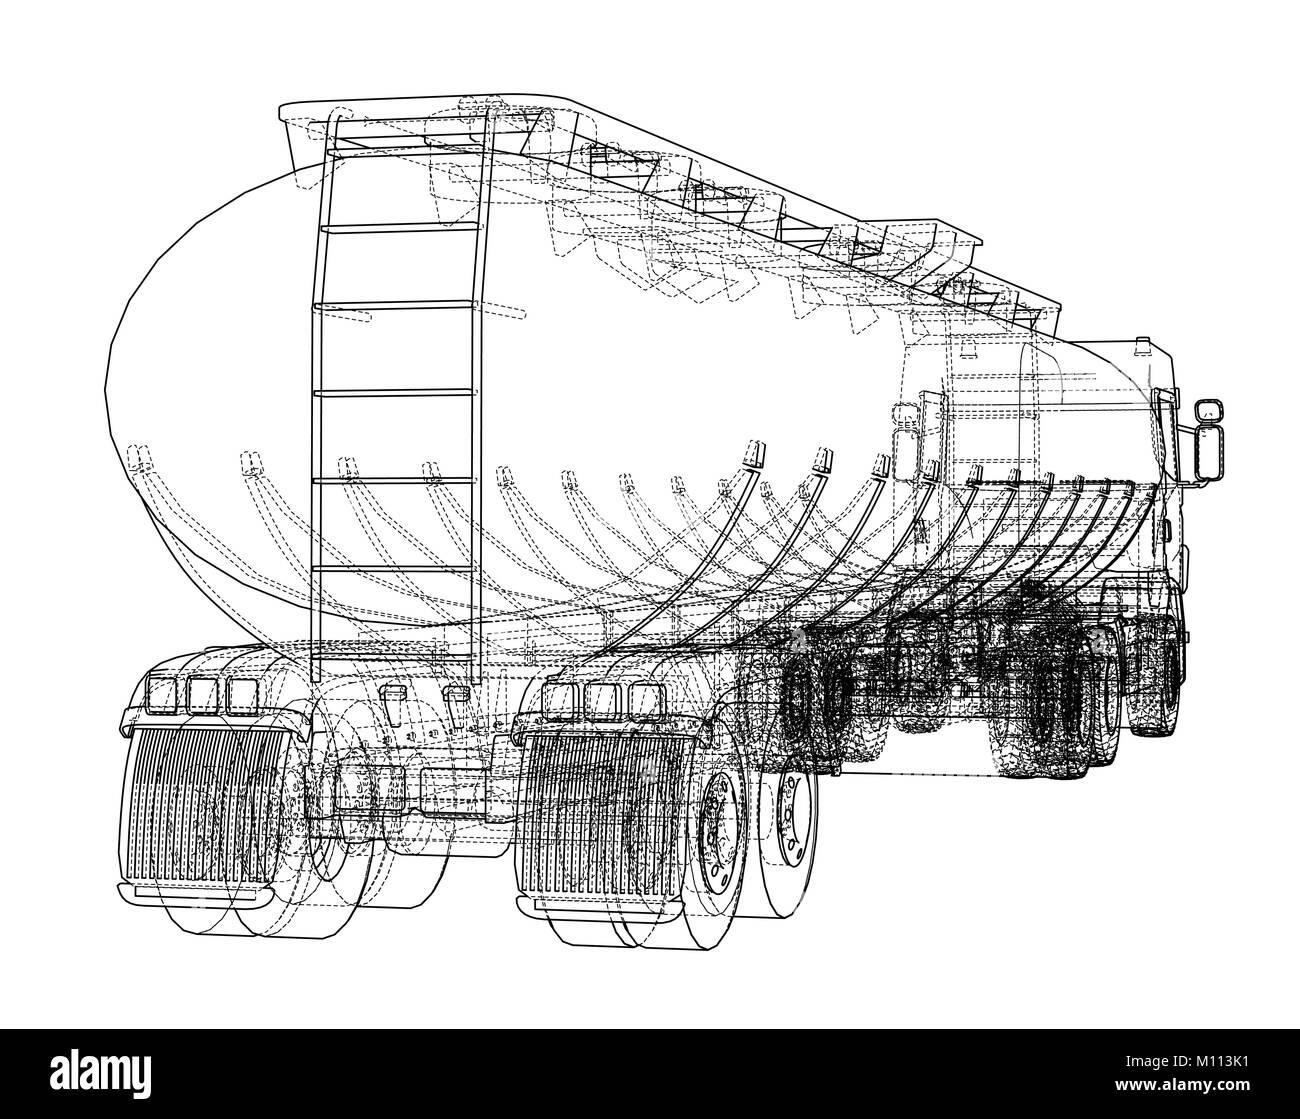 Fuel Lorry Tanker Stockfotos & Fuel Lorry Tanker Bilder - Seite 2 ...